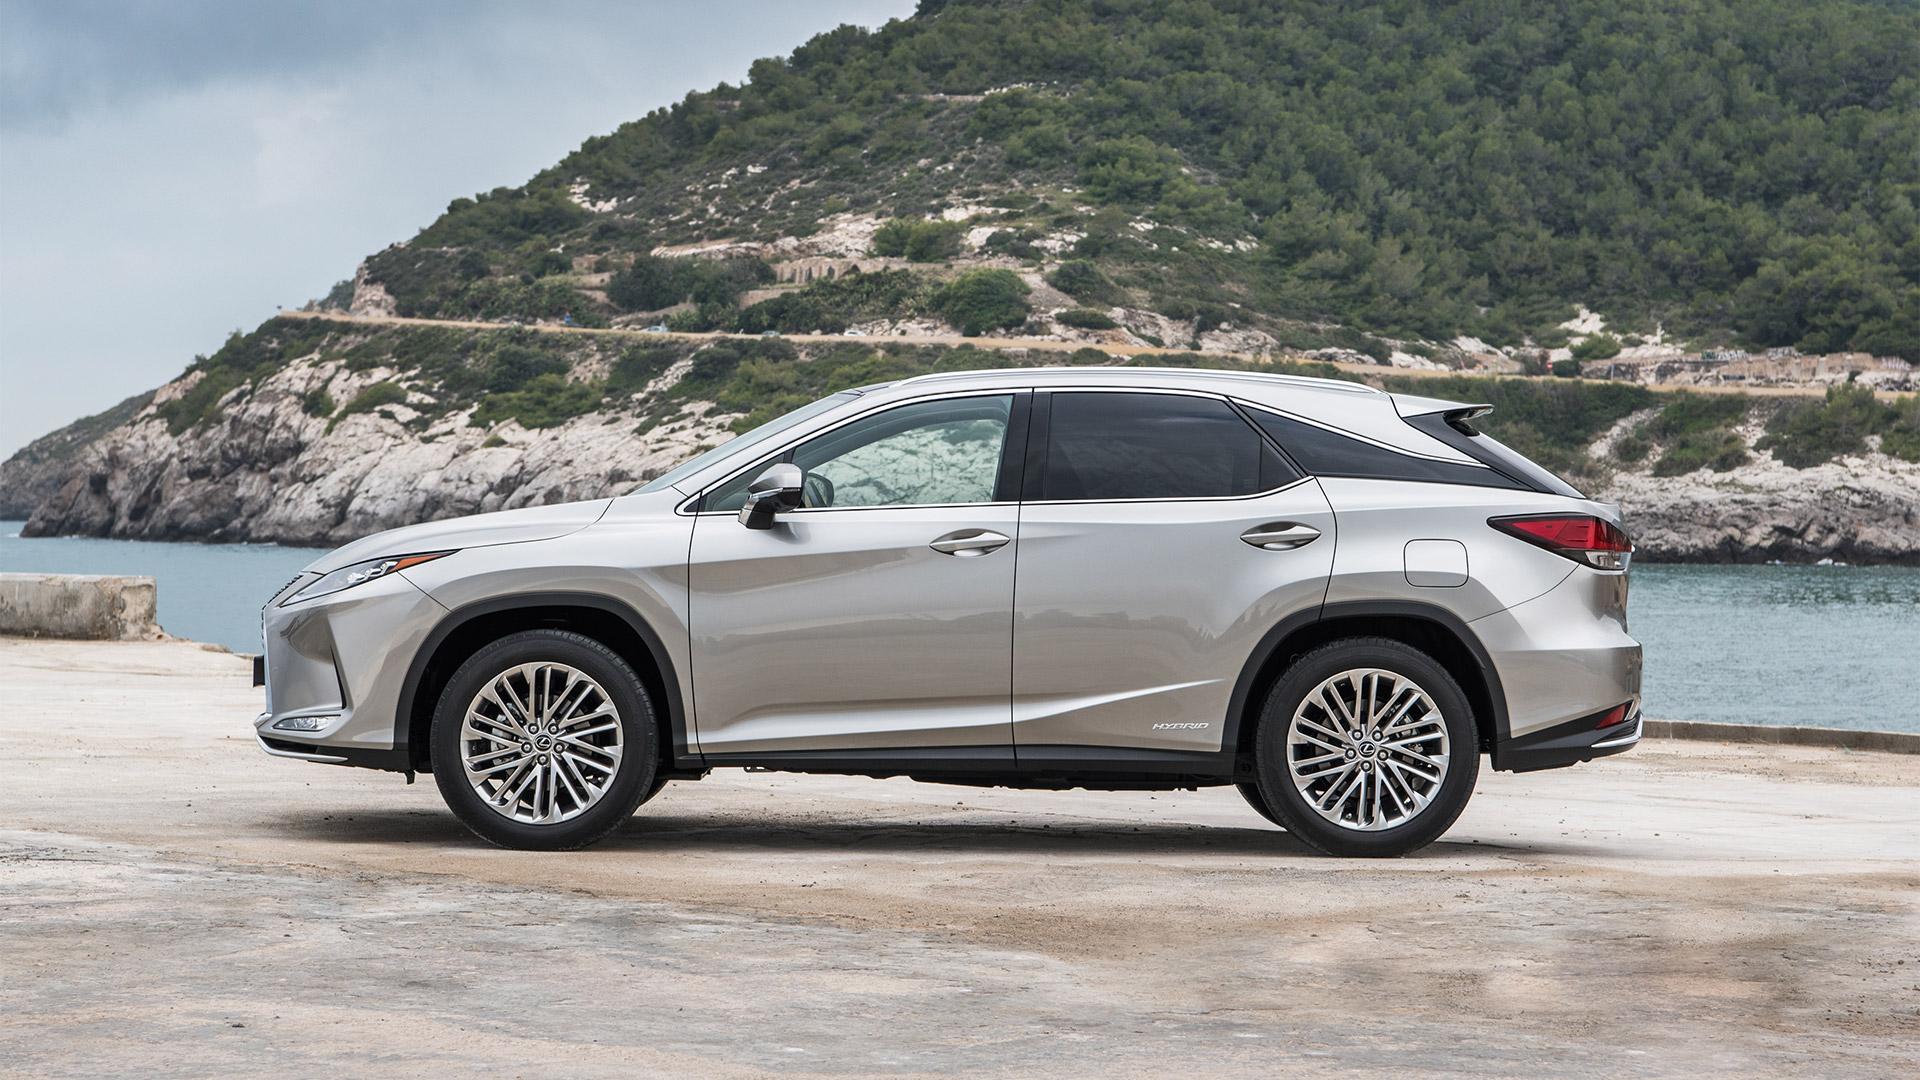 05 2019 020 Lexus RX pionier 1920x1080 galerij